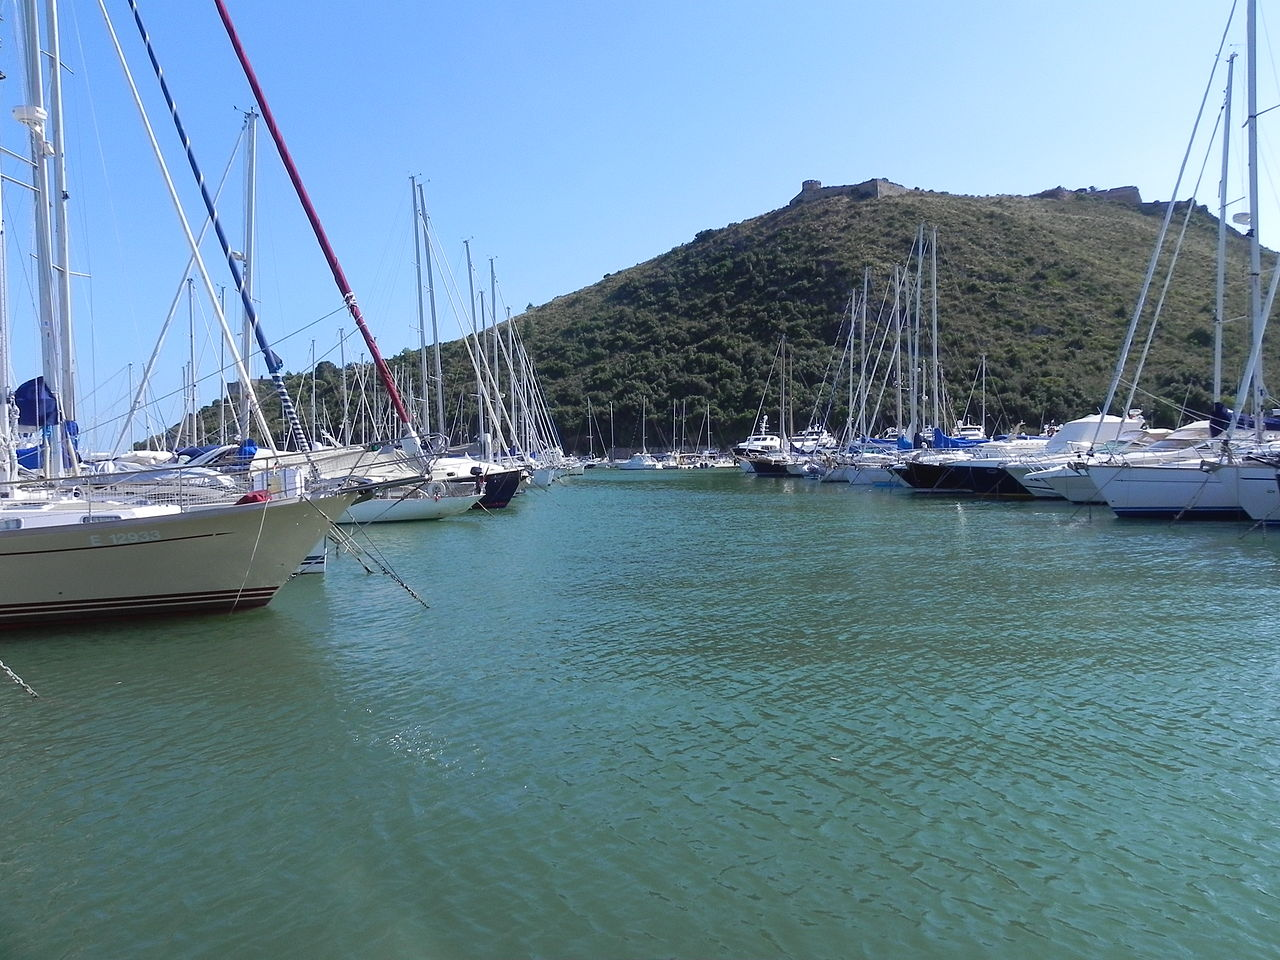 Noleggio Barche Cala Galera - Navalia | Noleggia un Sogno